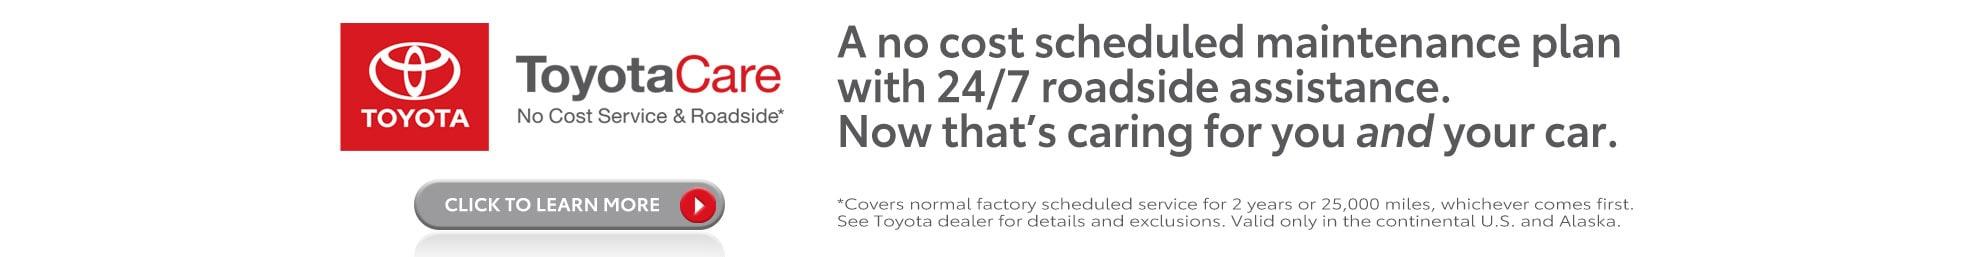 Arlington Toyota Dealer | Vandergriff Toyota | in Arlington, near